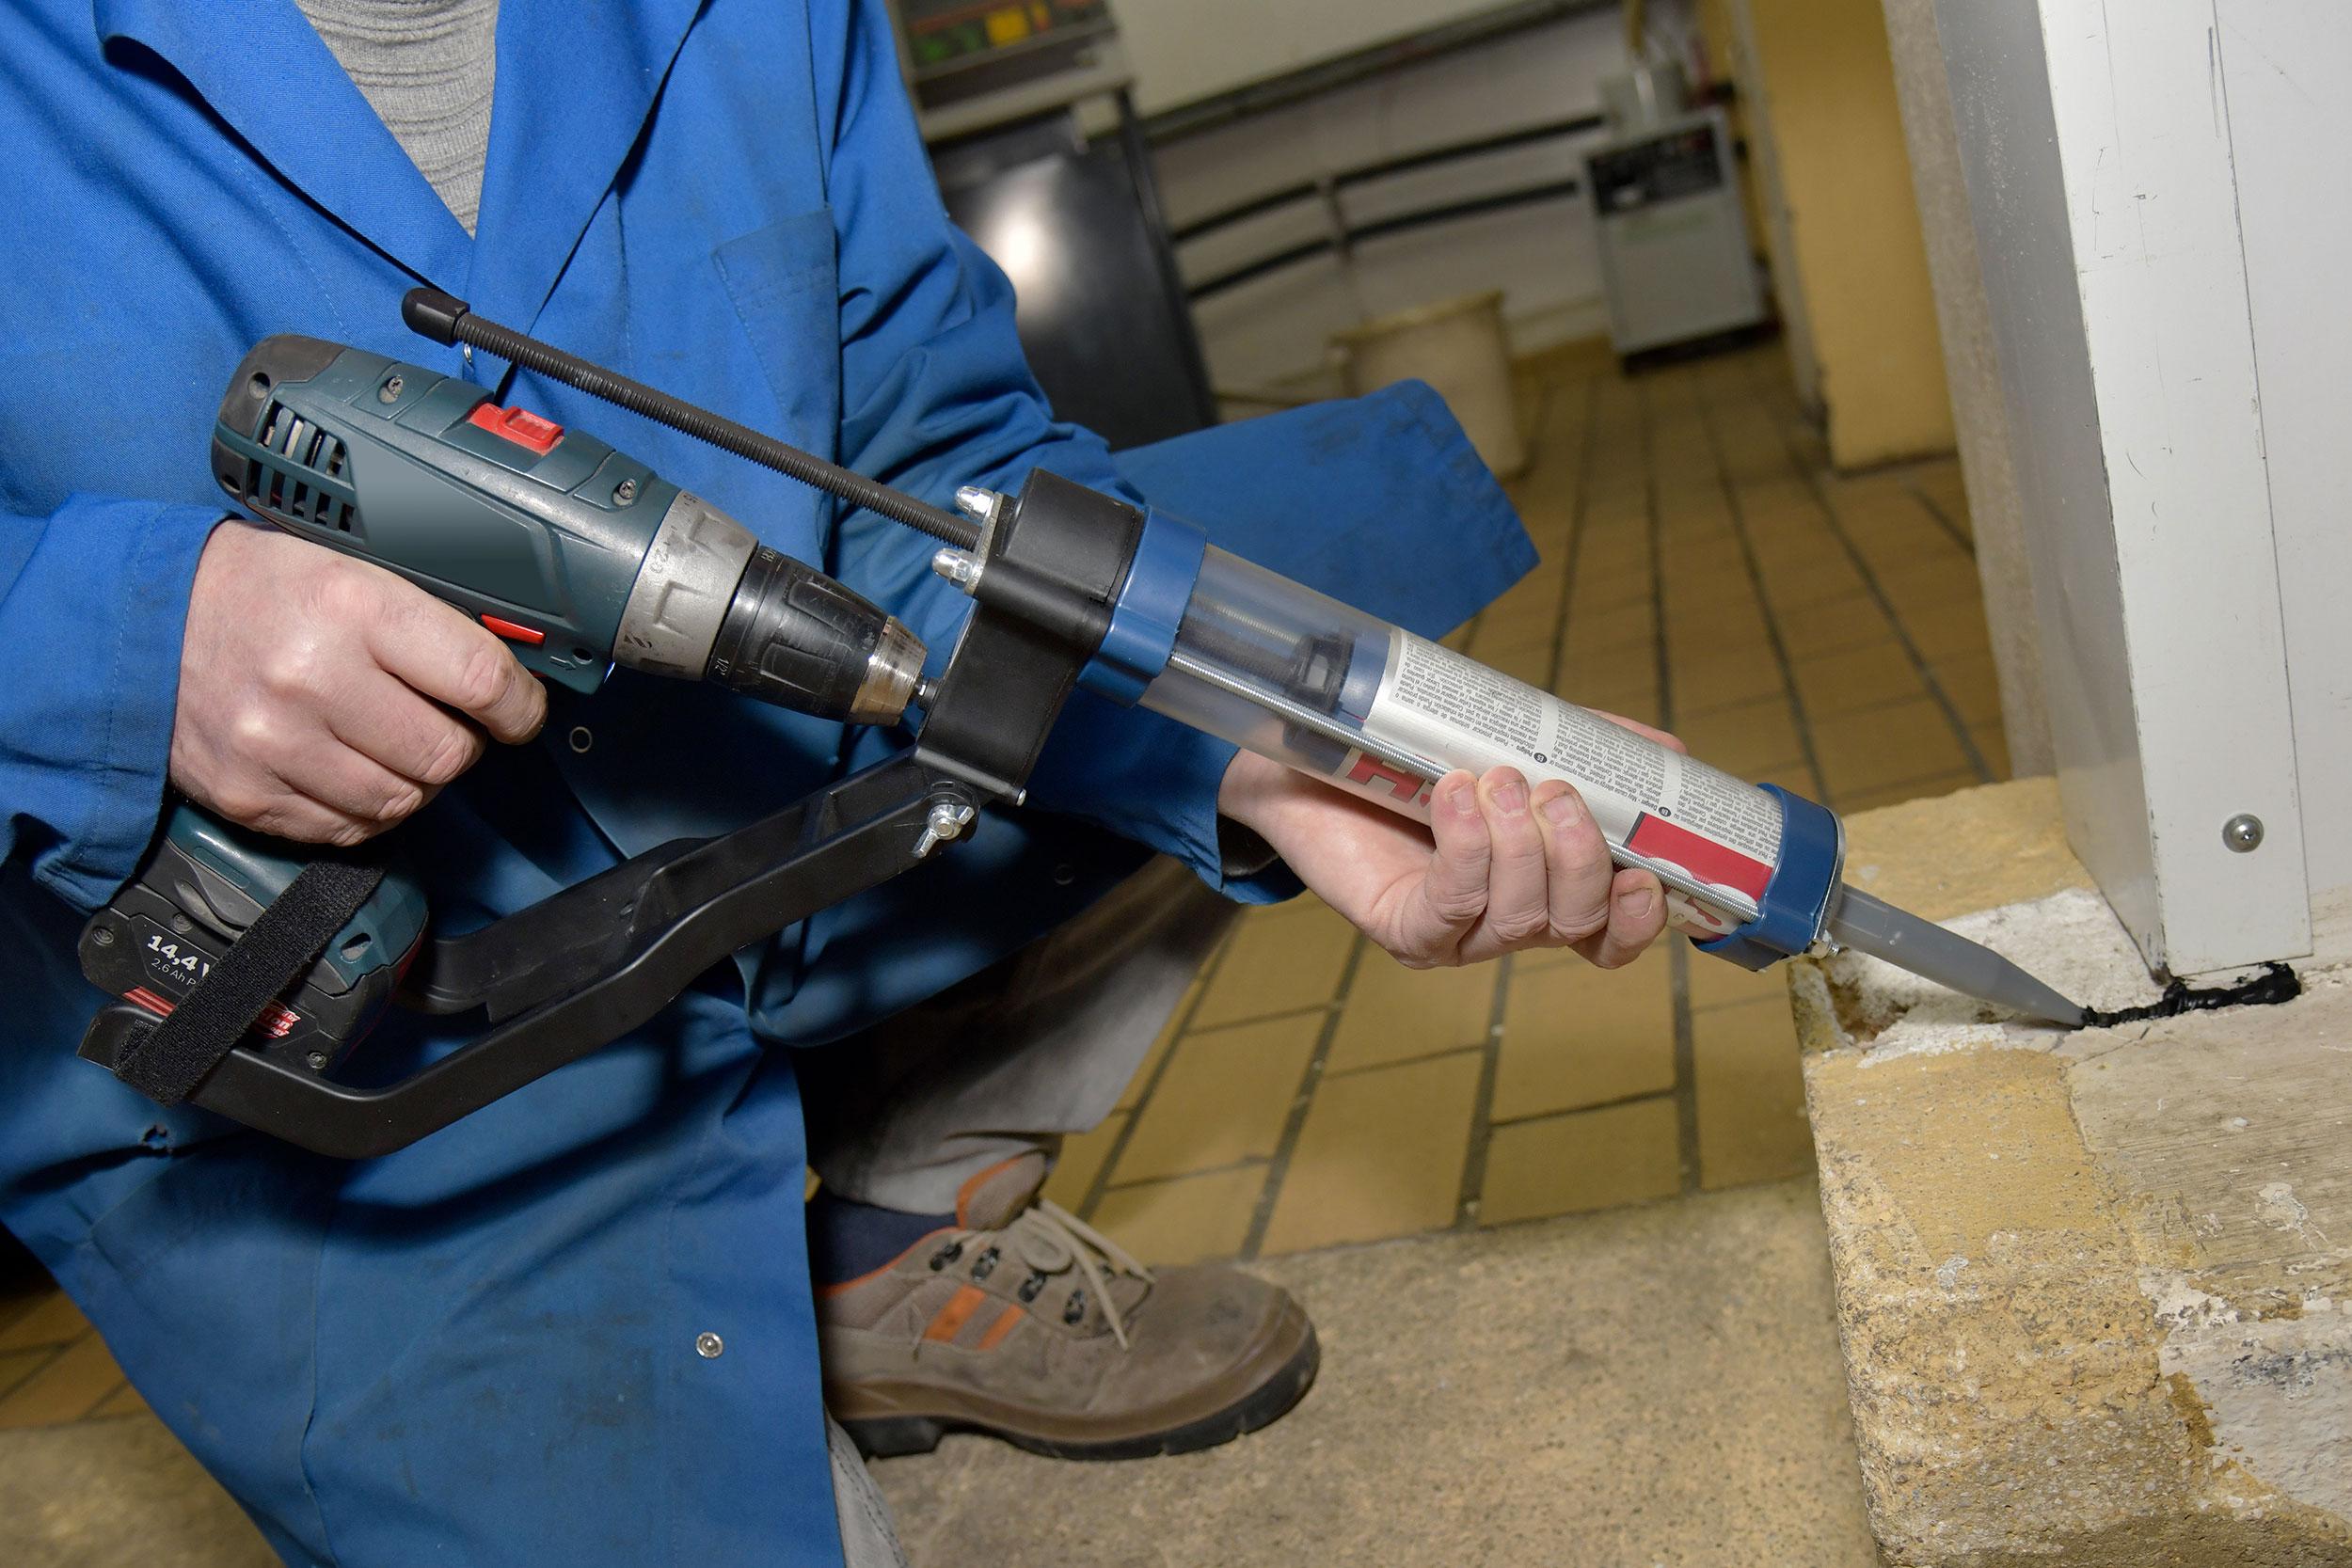 Pistolet-a-cartouche-VGUN-situation-S400-1.jpg